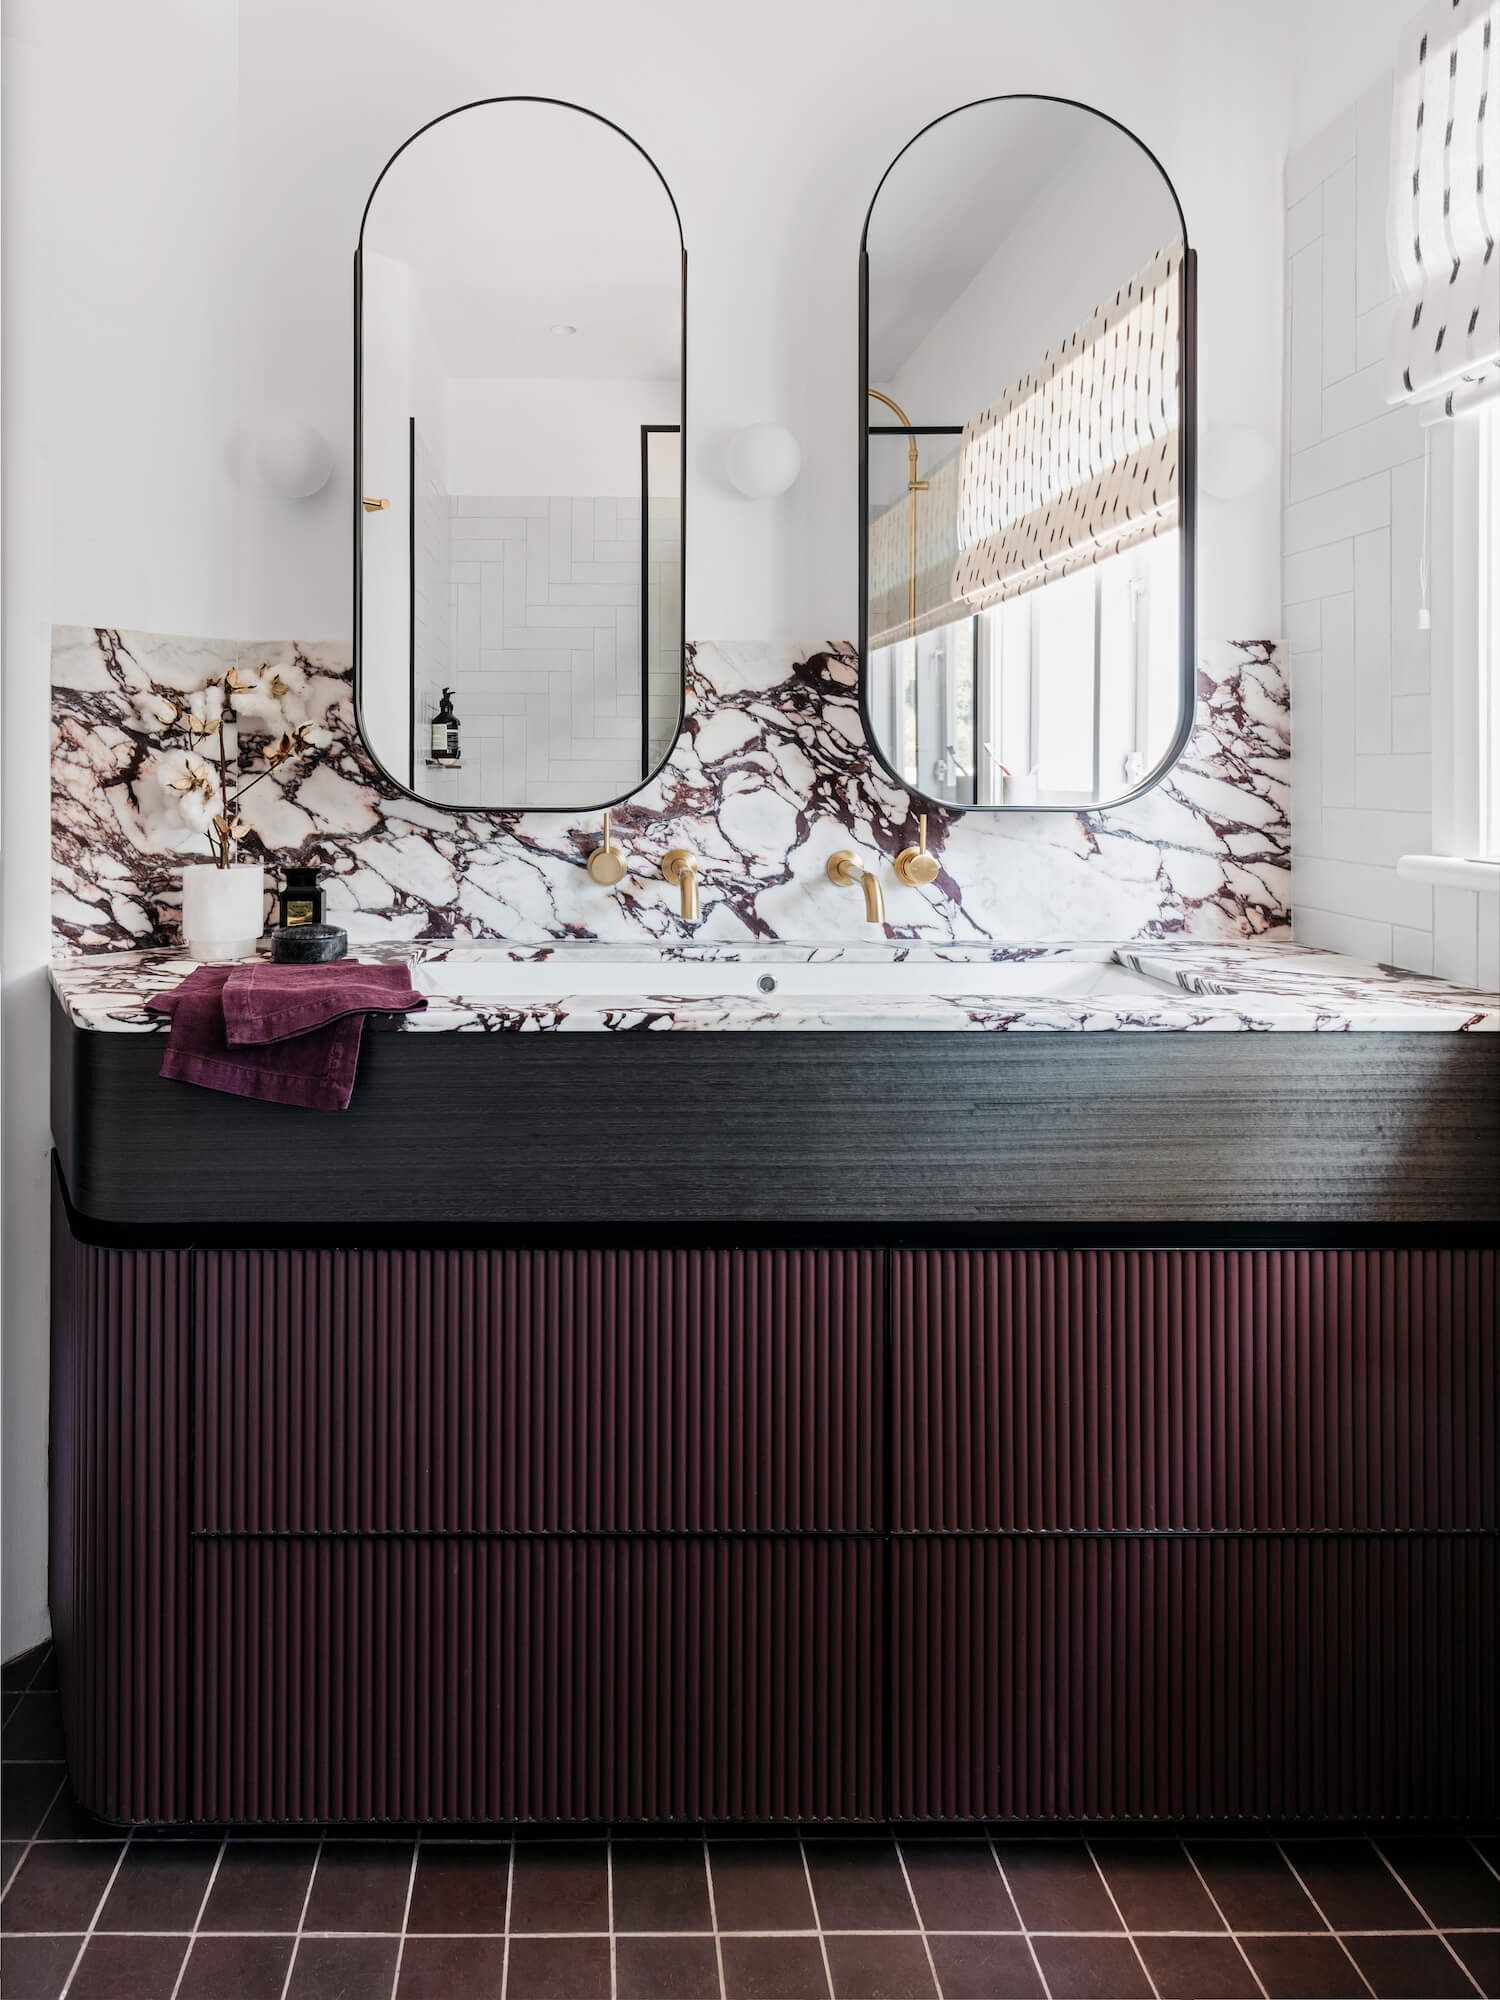 bathroom, white wall, black floor tiles, white marble top and bakcsplash, black lines, dark cabinet